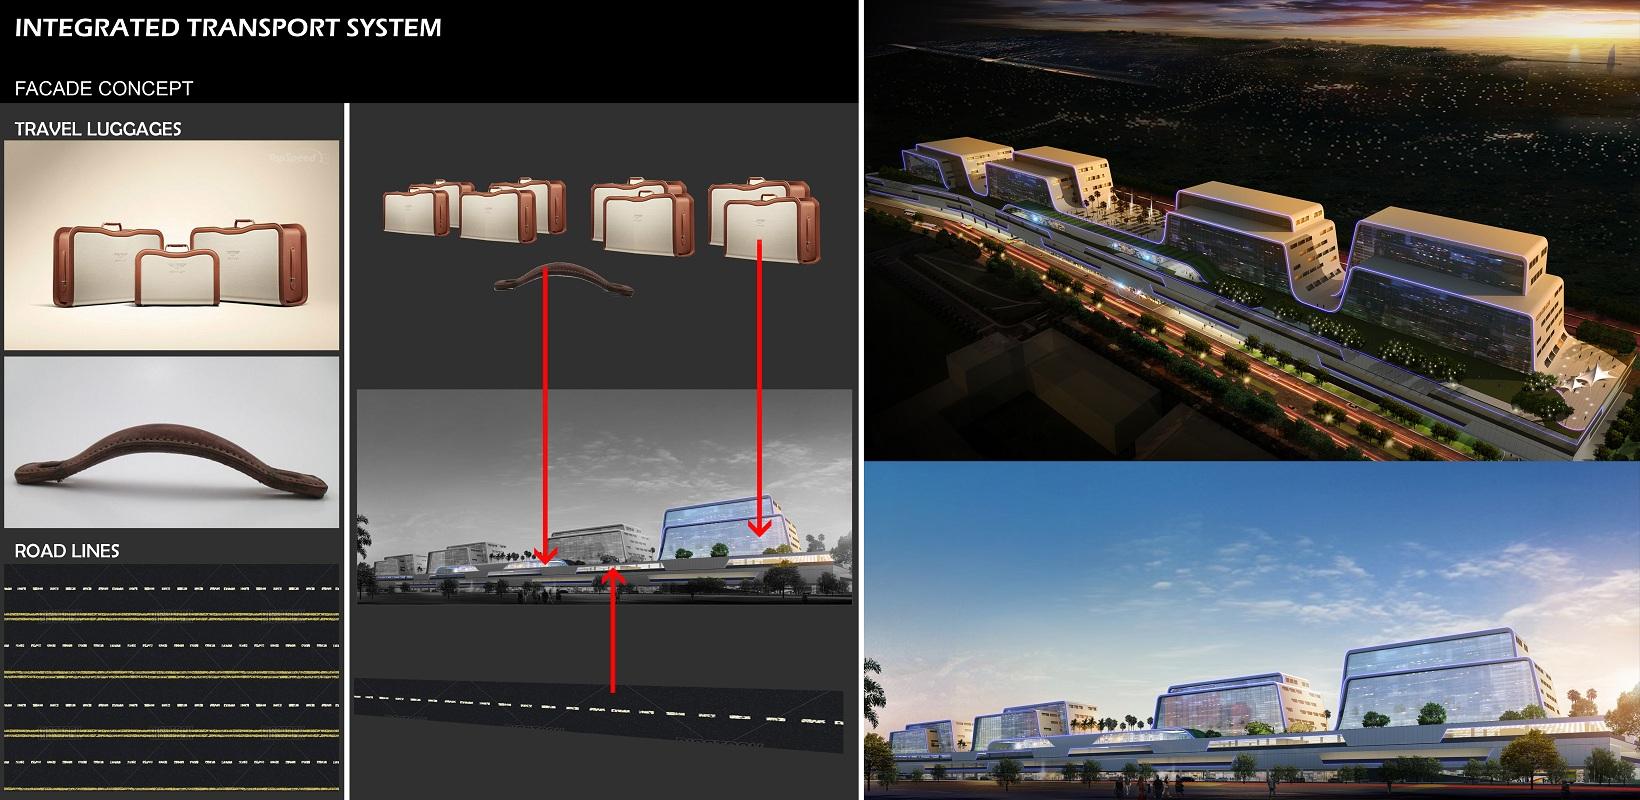 ASYA-Southwest Integrated Transport Station